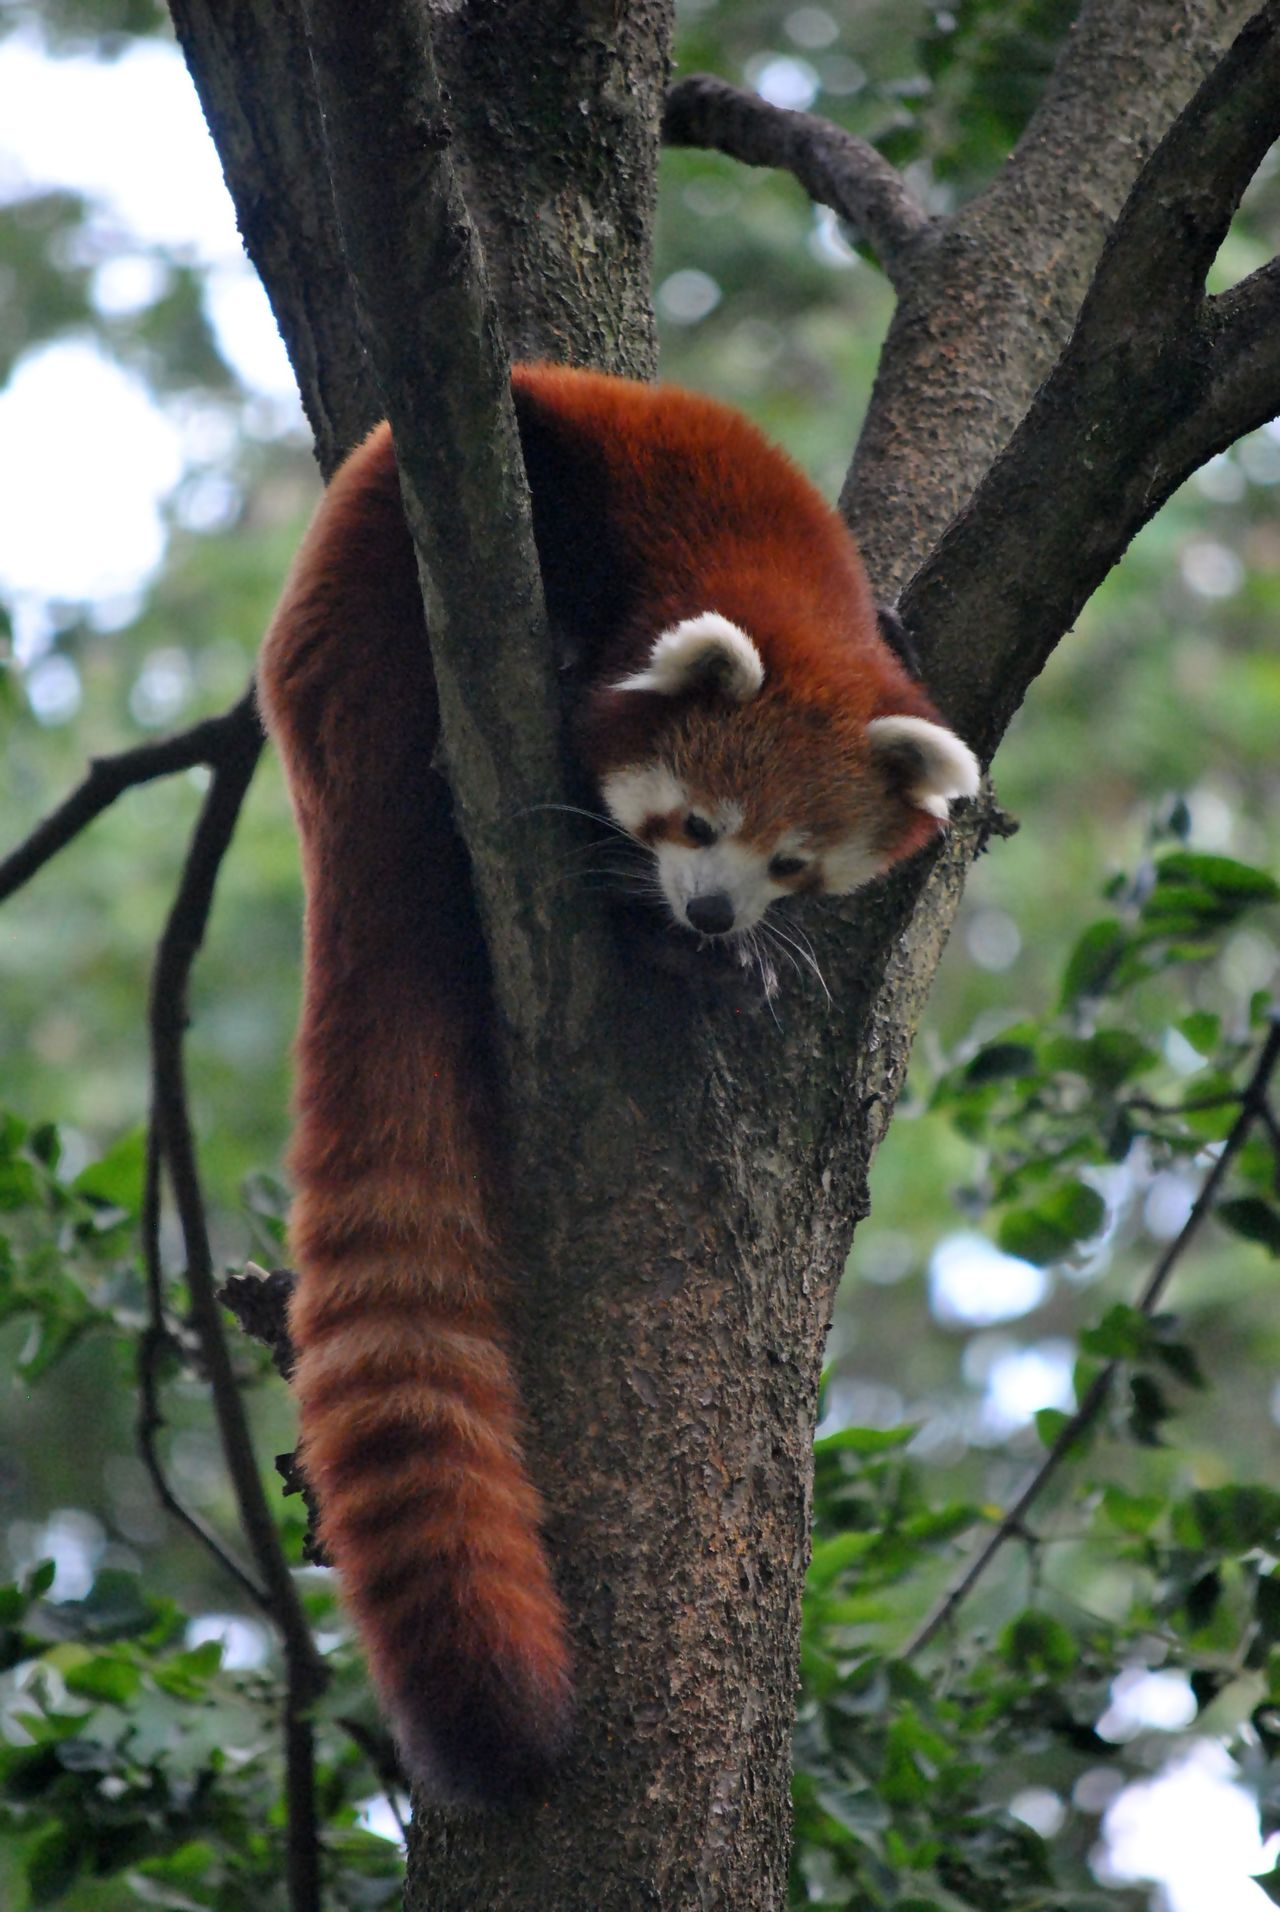 Animal Themes Animal Wildlife Animals In The Wild Branch Day Focus On Foreground Mammal Nature No People One Animal Outdoors Panda - Animal Red Panda Tree Tree Trunk